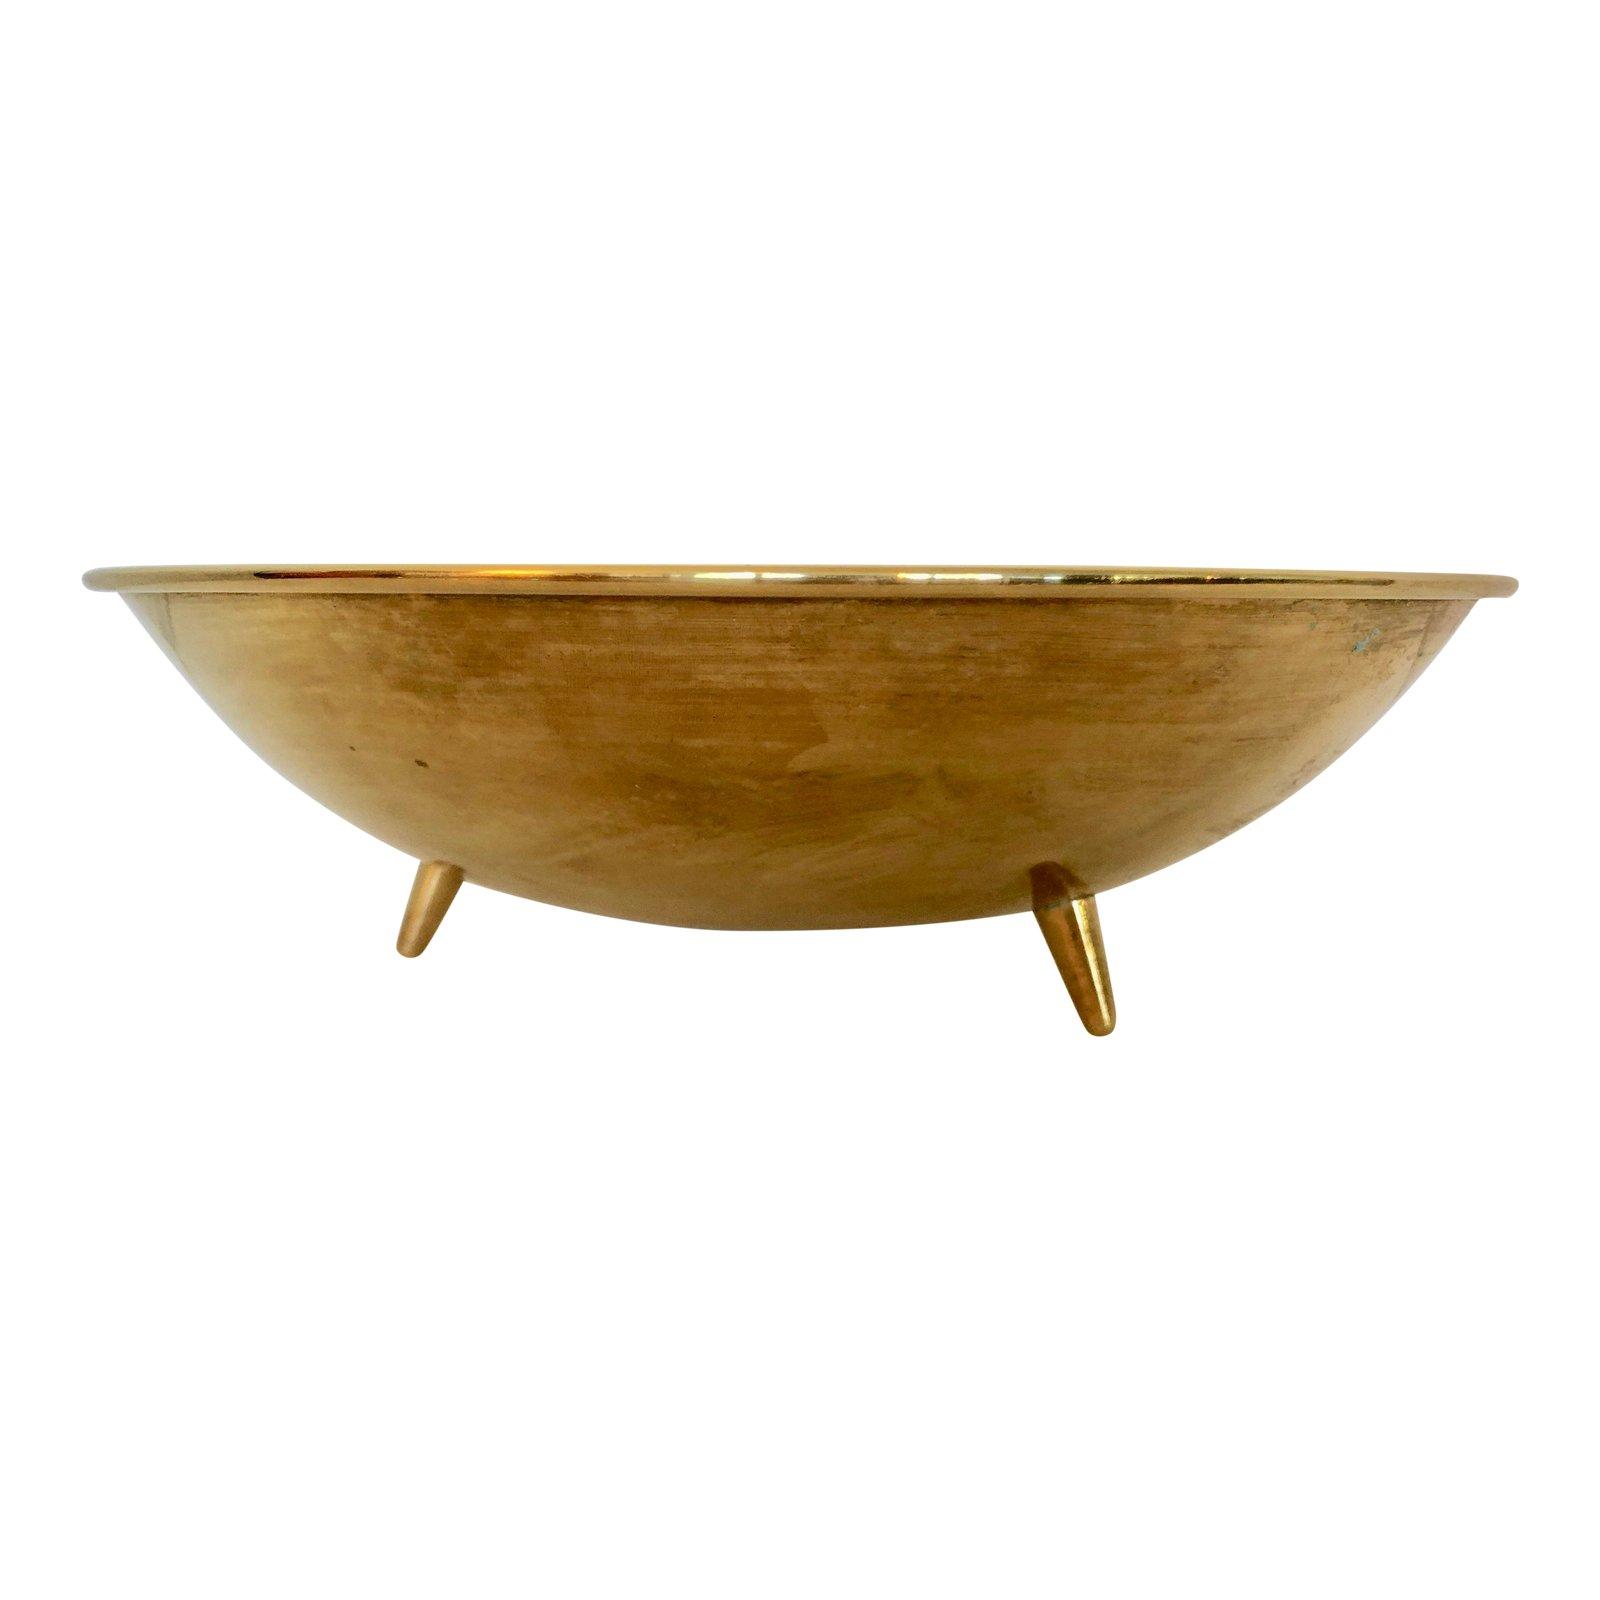 vintage-brass-centerpiece-bowl-6167.jpeg